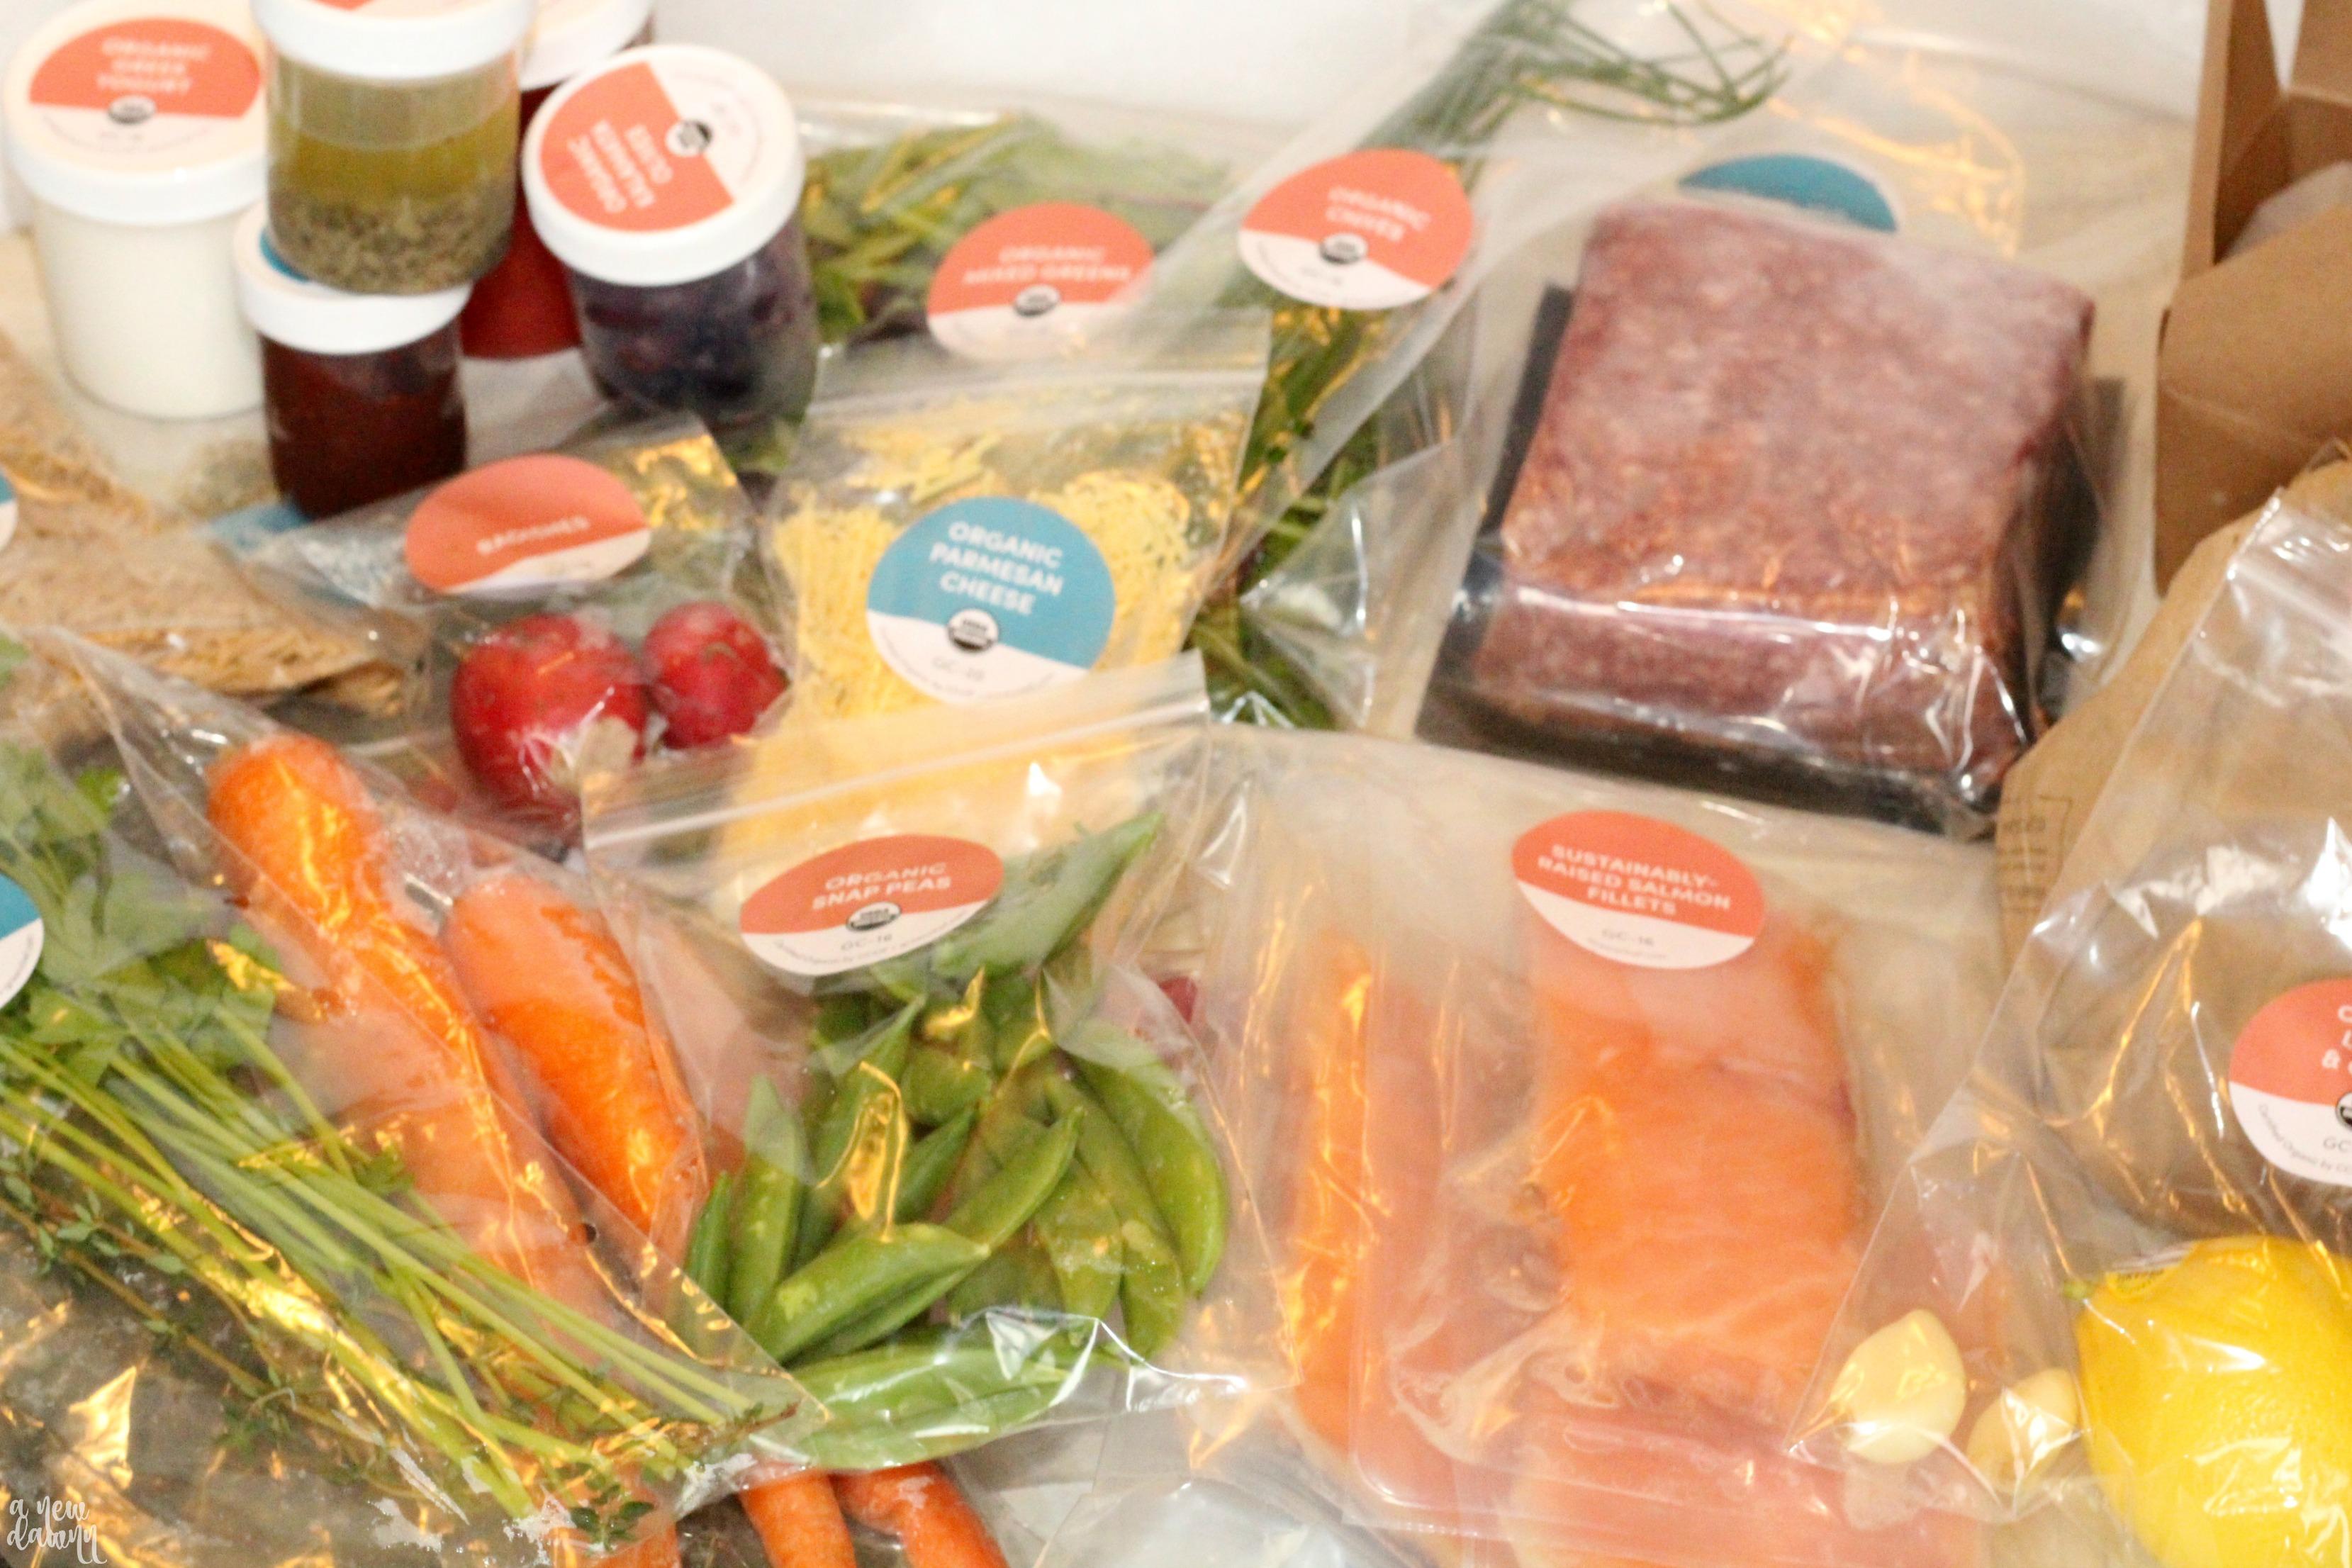 Green Chef Organic Meal Kit